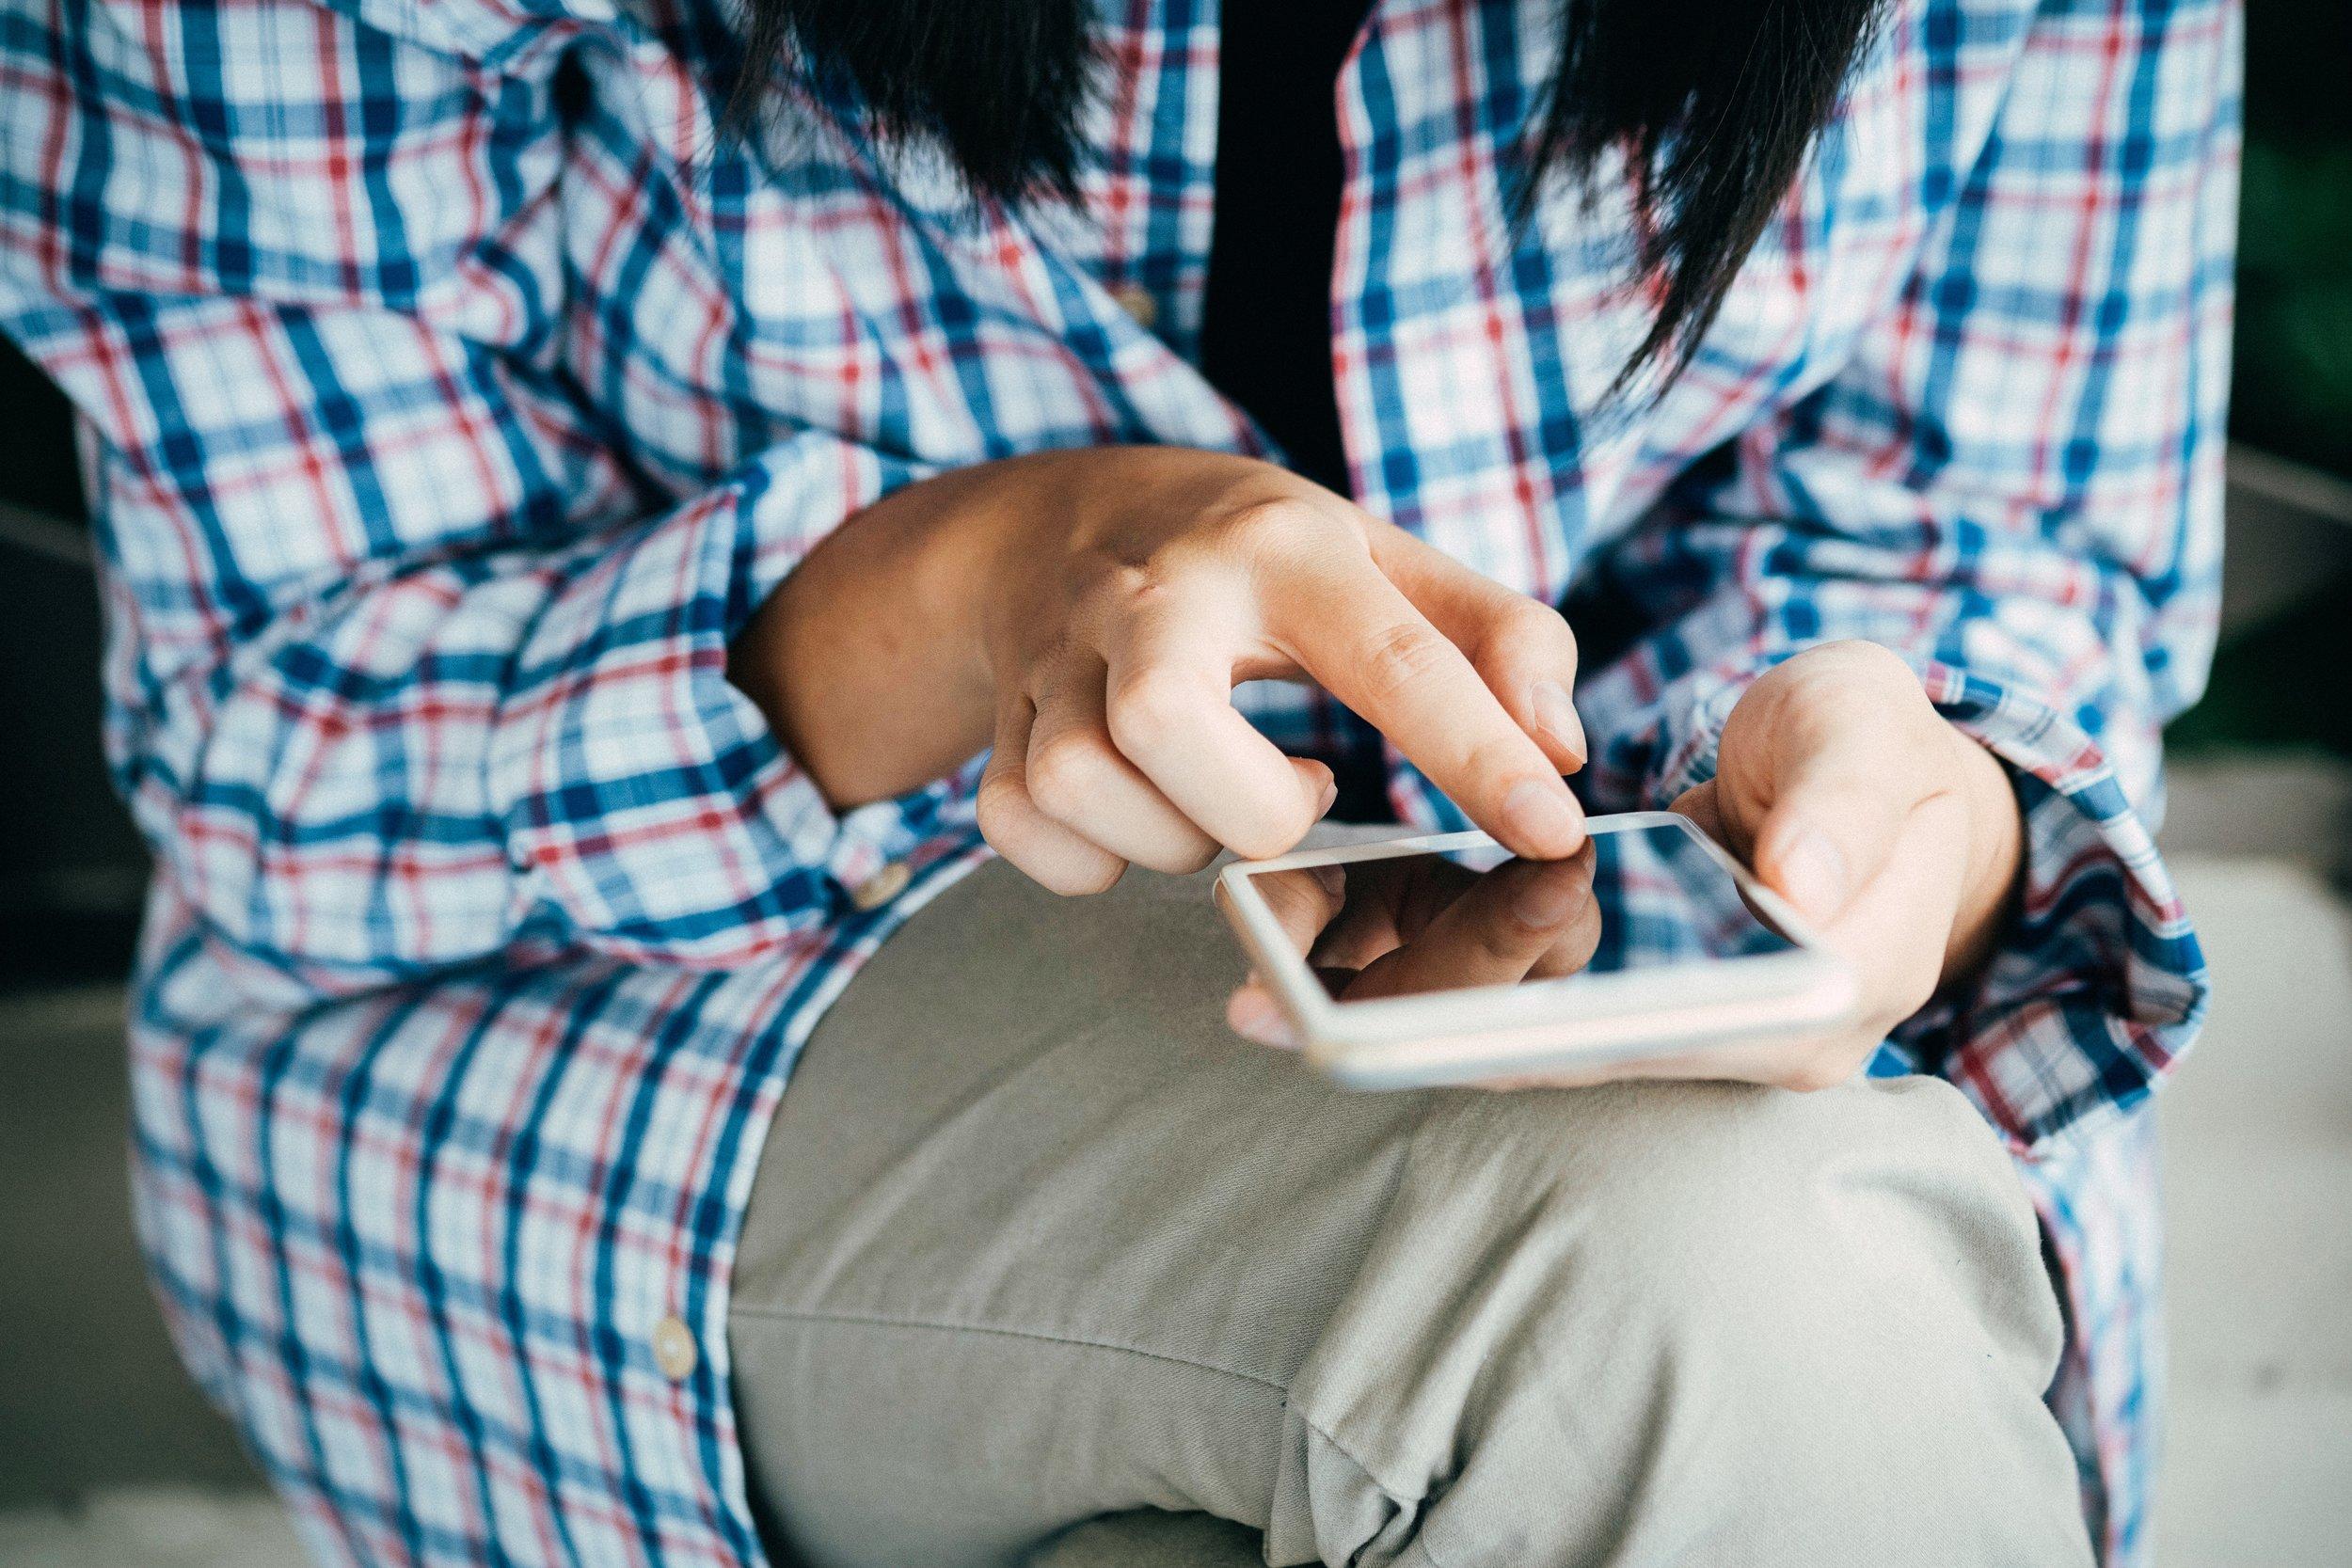 cellphone-close-up-communication-367273.jpg